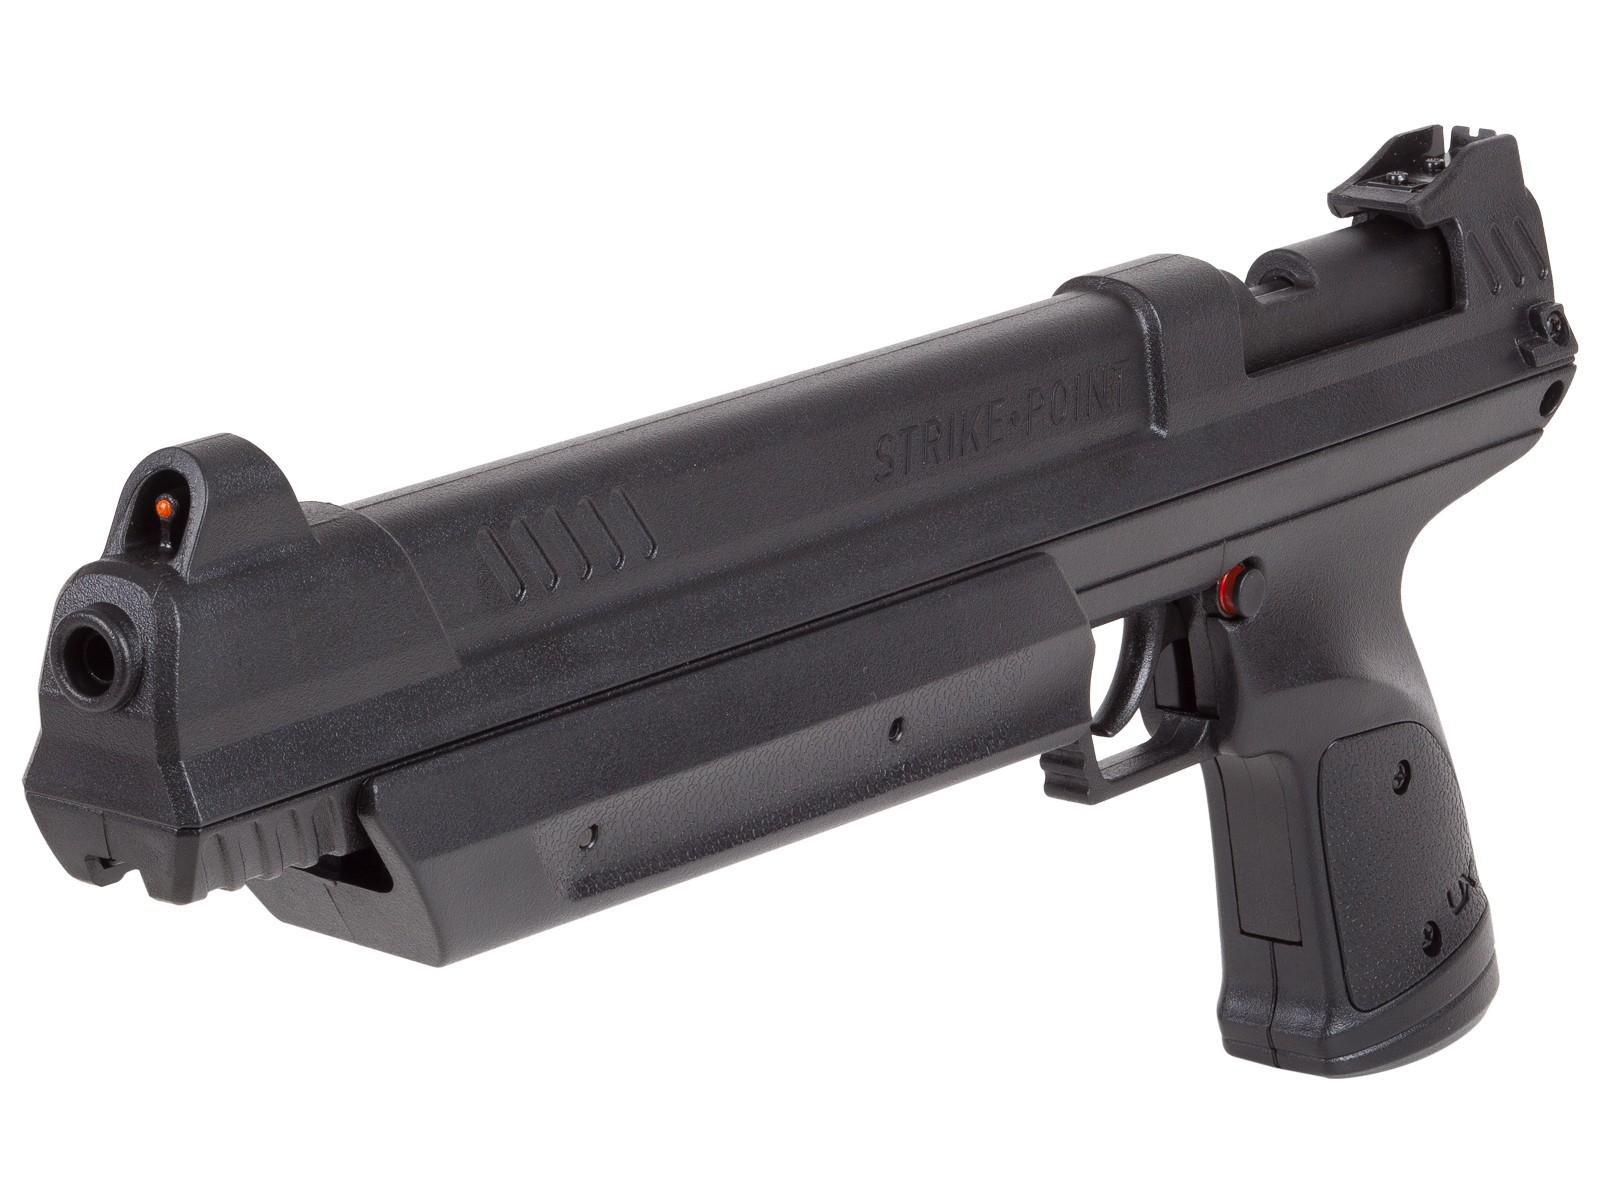 Umarex Strike Point Pellet Multi-Pump Air Pistol 0.22